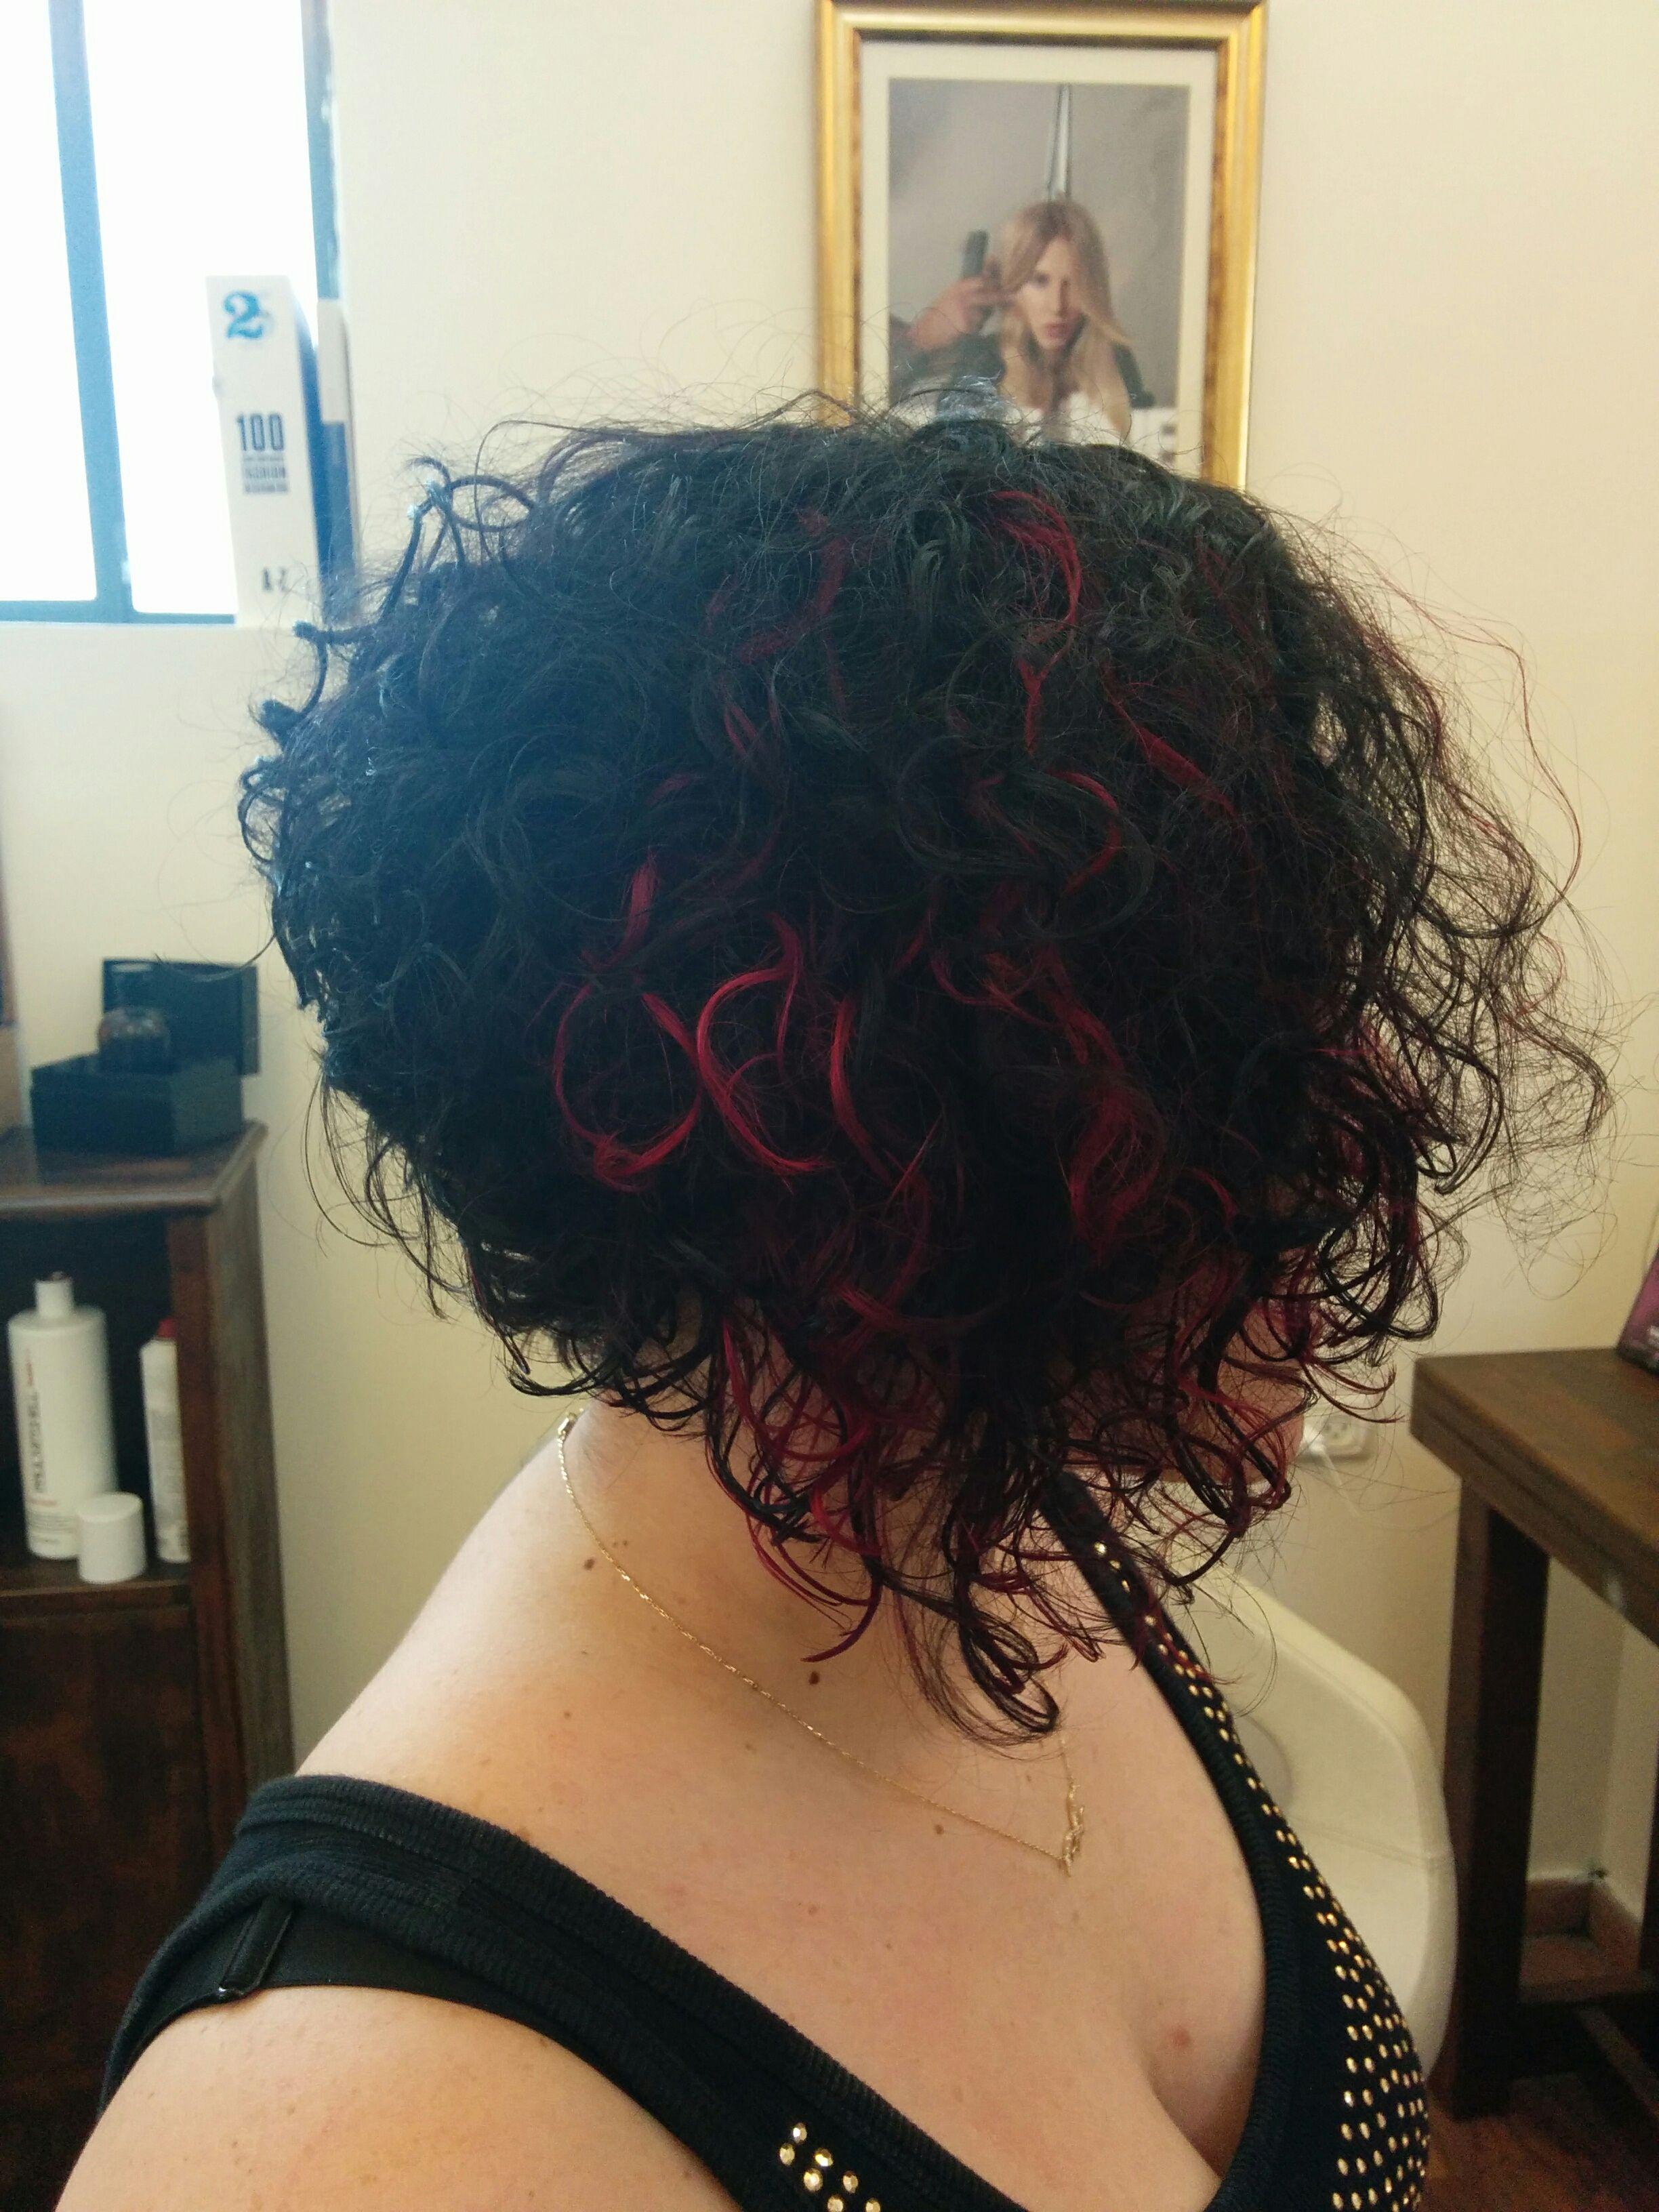 L'Oréal Advanced Haircare Extraordinary Oil Curls Collection @Influenster #extraordinaryhair #spon4loreal